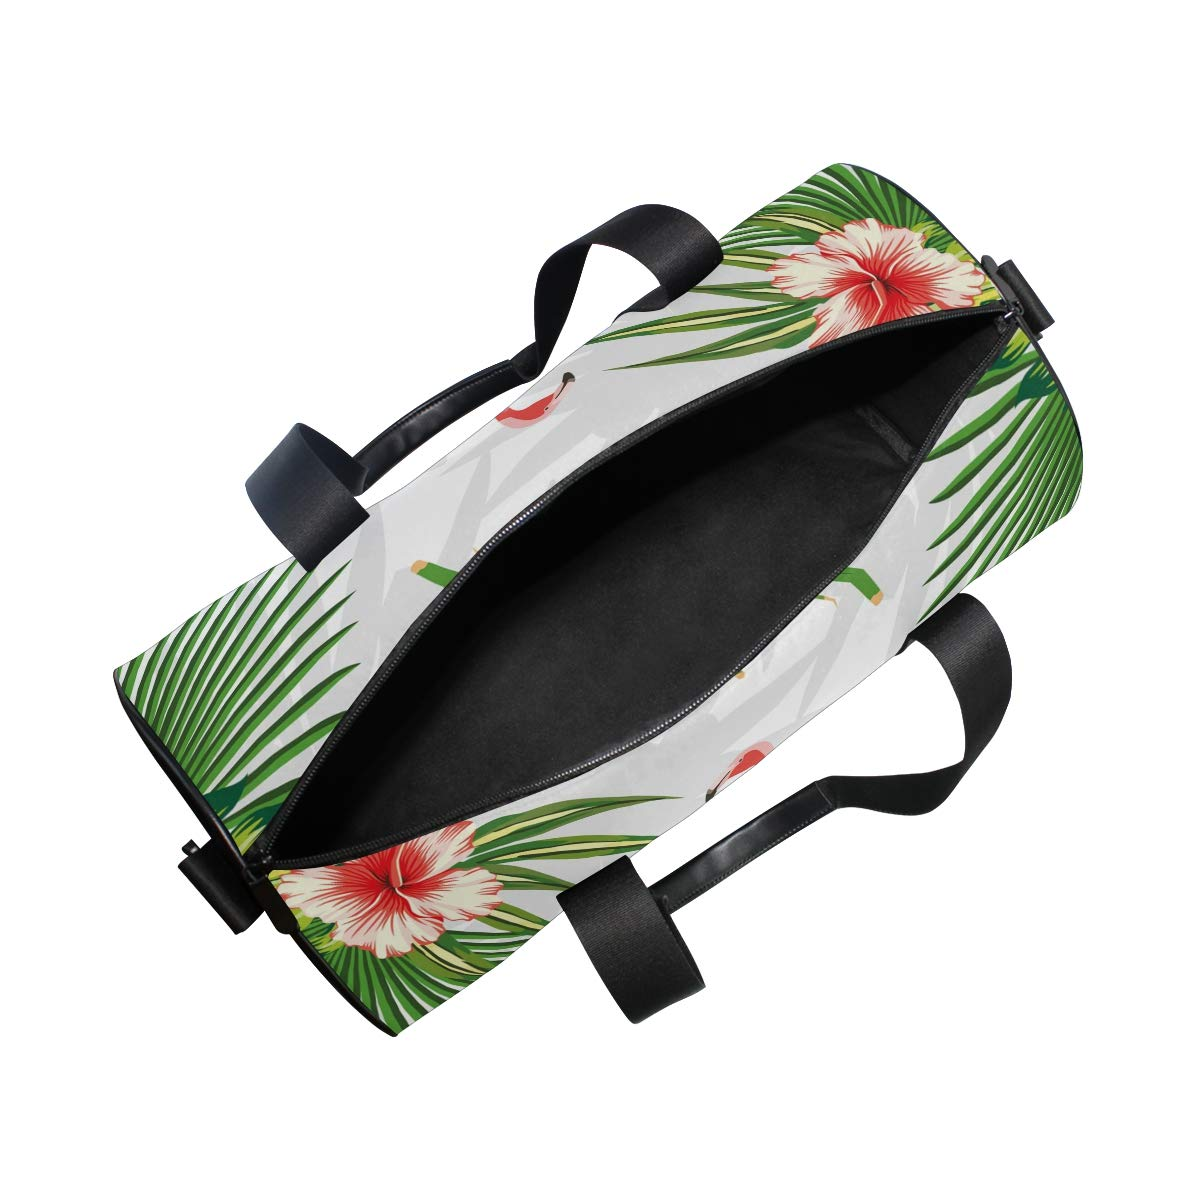 Flamingo Sports Gym Bag Travel Duffel Bag with Pockets Luggage & Travel Gear Shoulder Strap Fitness Bag by EVERUI (Image #5)